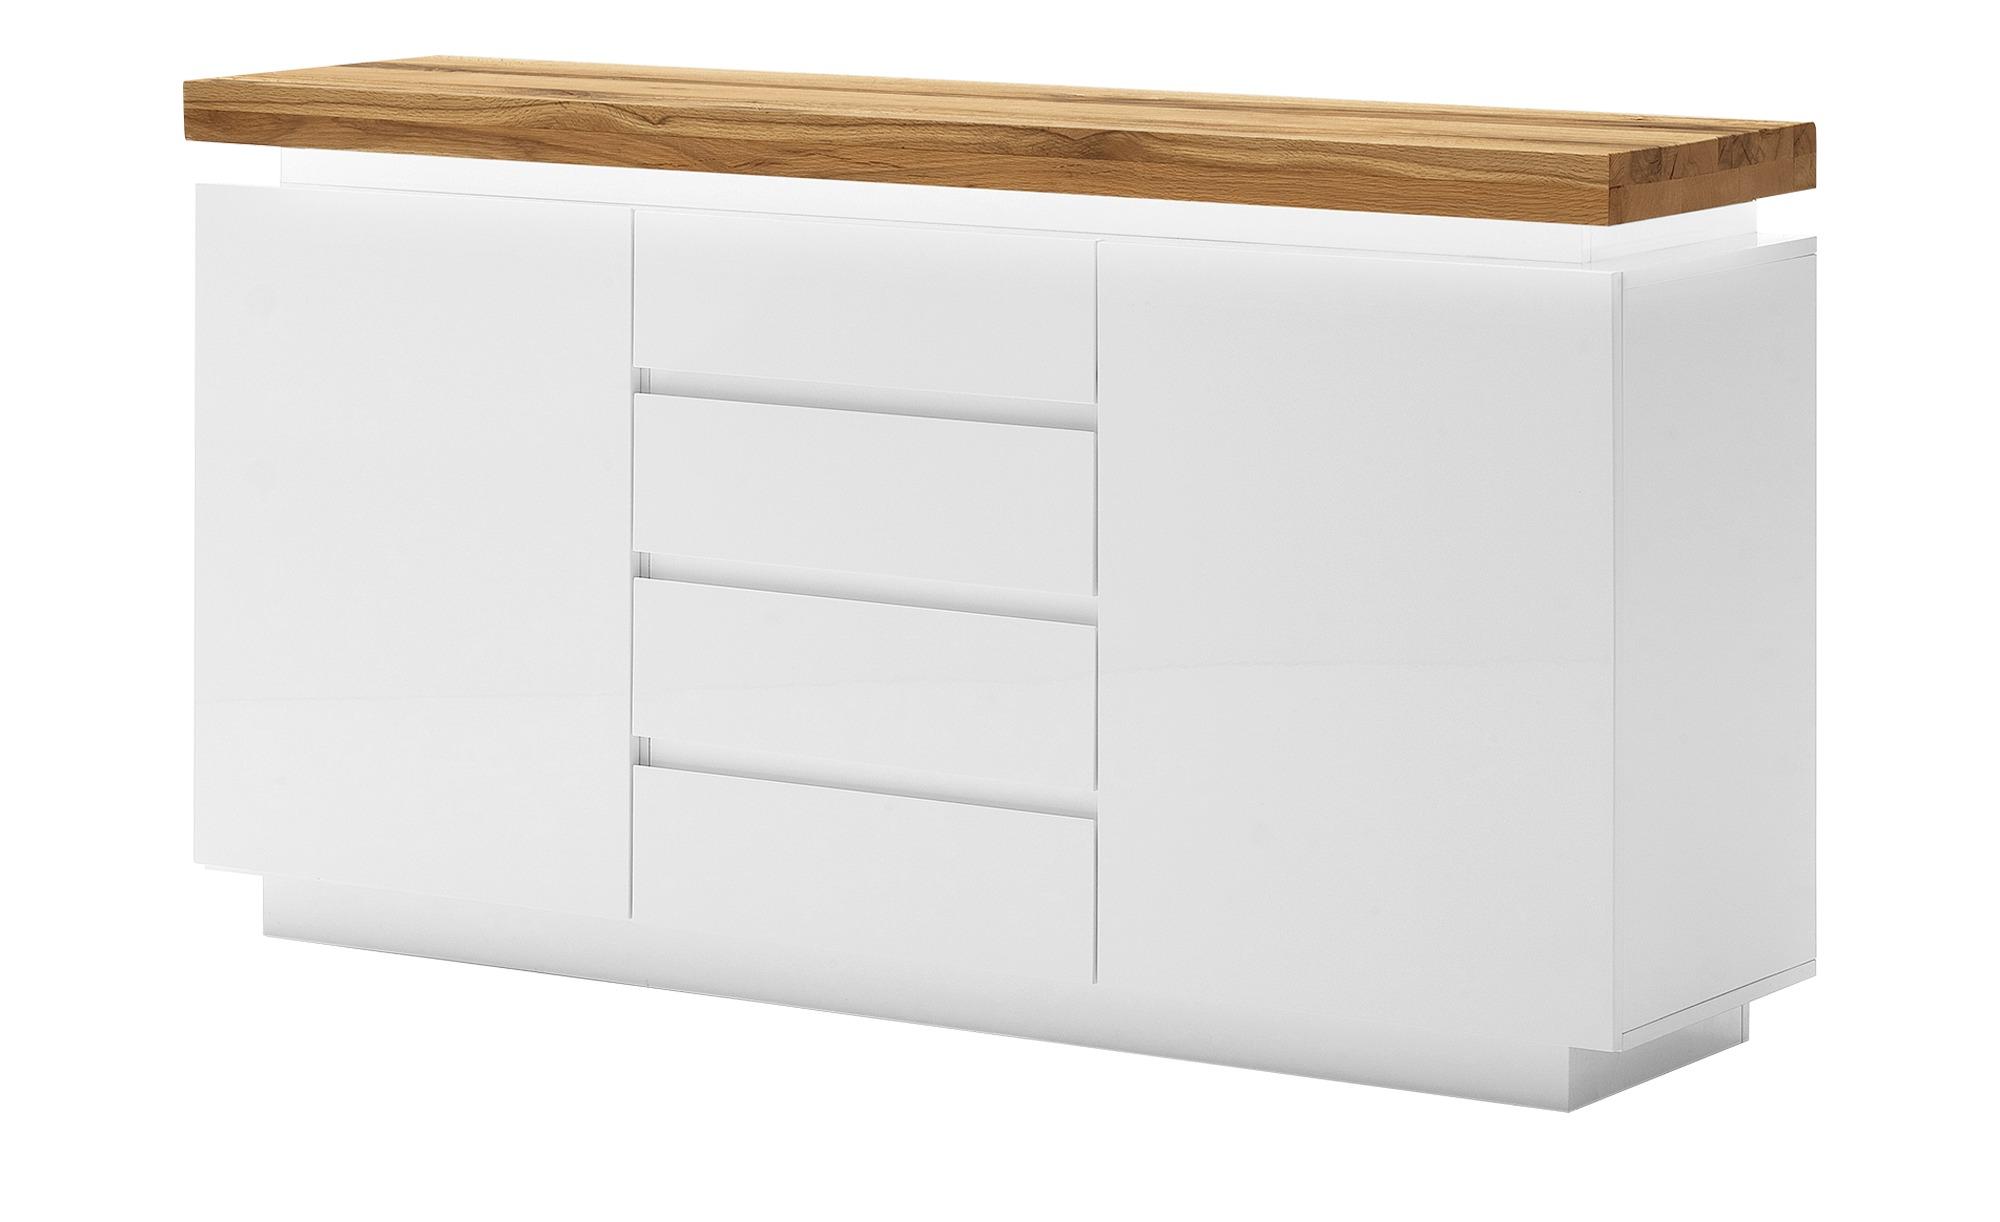 Sideboard  Fornico ¦ weiß ¦ Maße (cm): B: 150 H: 81 T: 40 Kommoden & Sideboards > Sideboards - Höffner